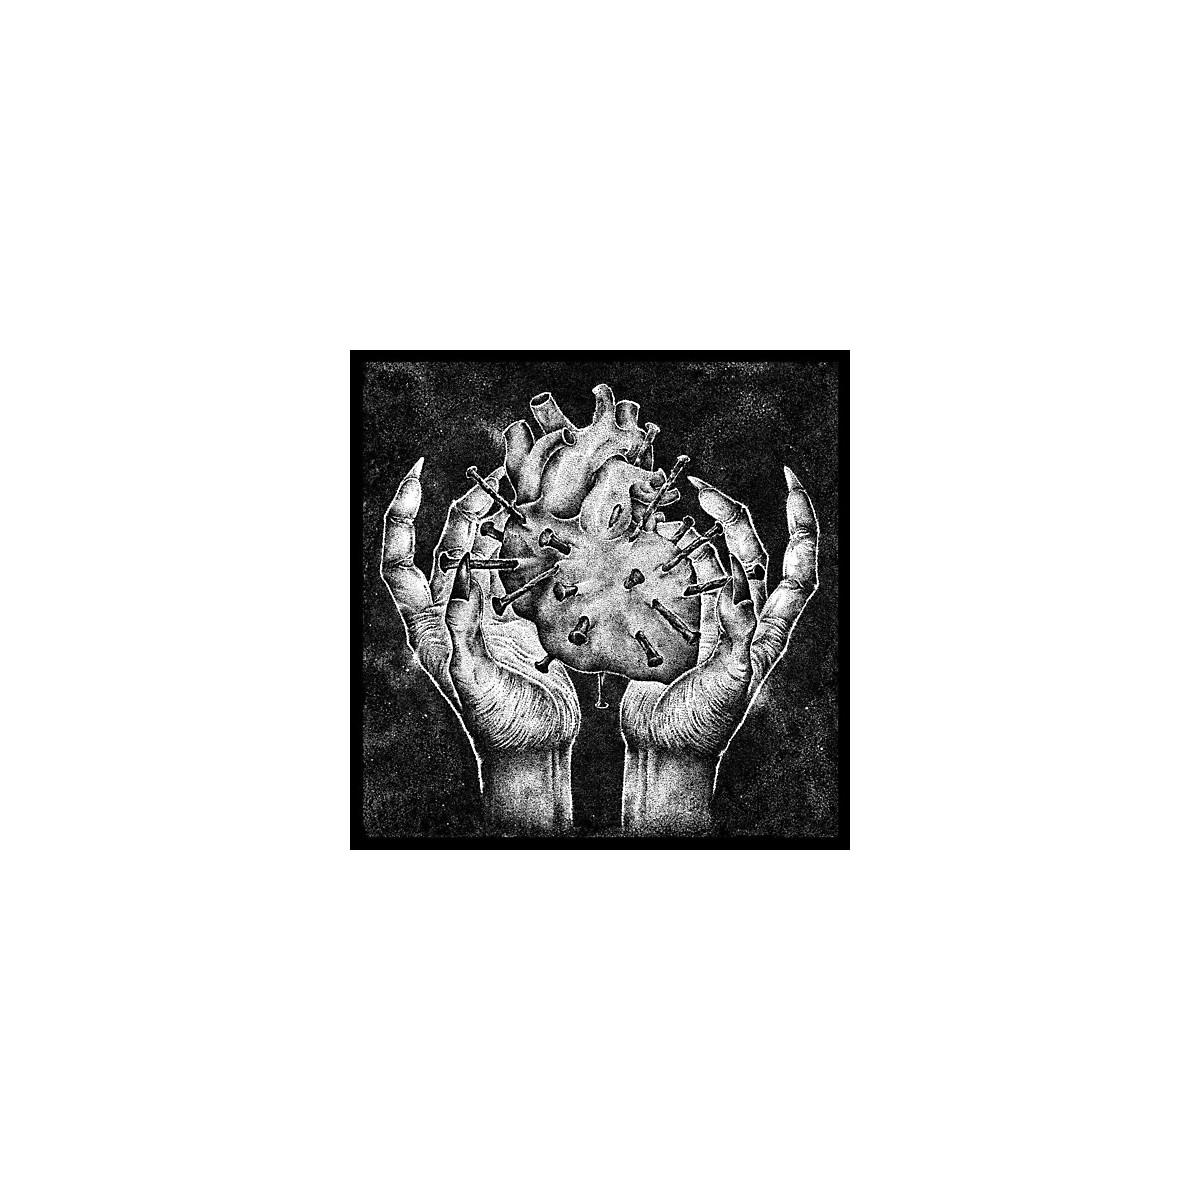 Alliance Shades - Black Heart Communion